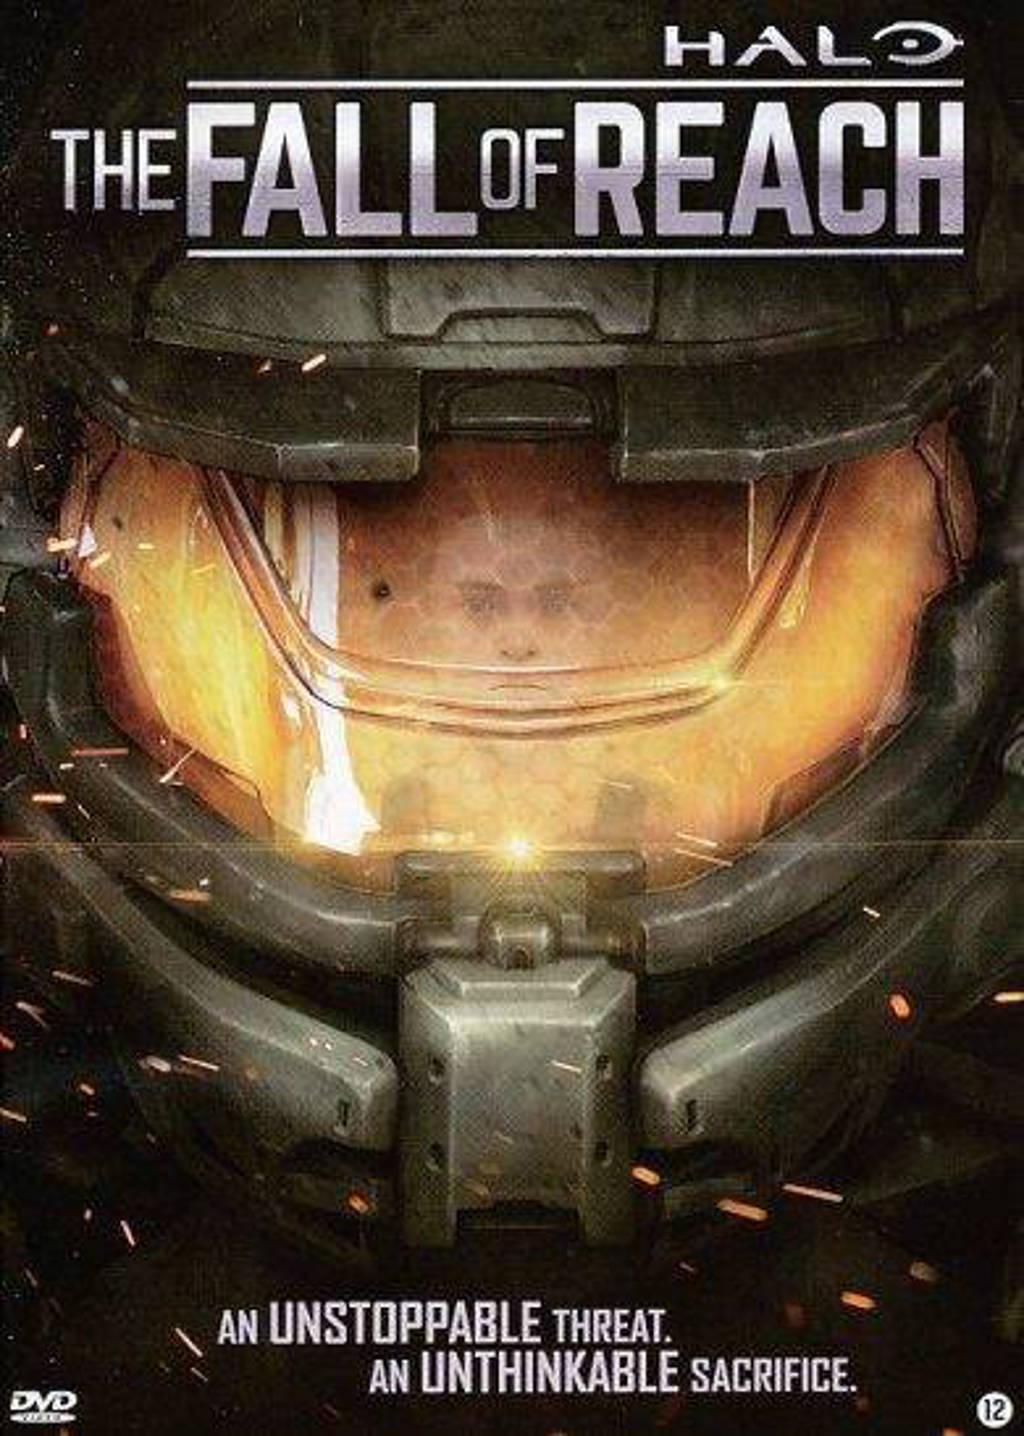 Halo - Fall of reach (DVD)